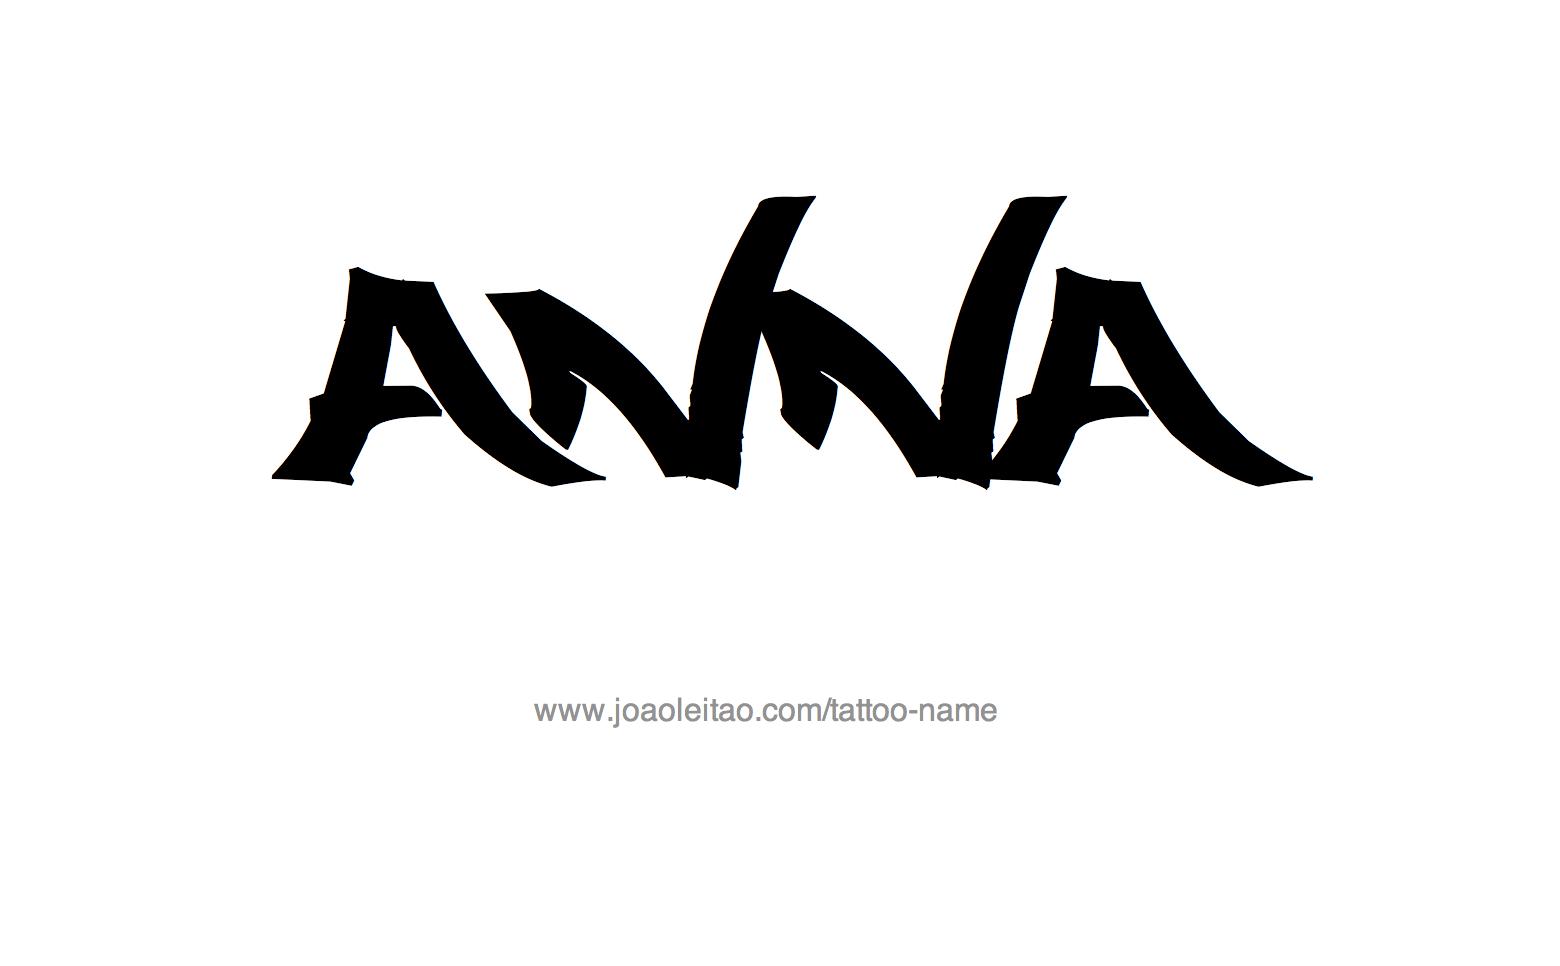 Anna Name Tattoo Designs